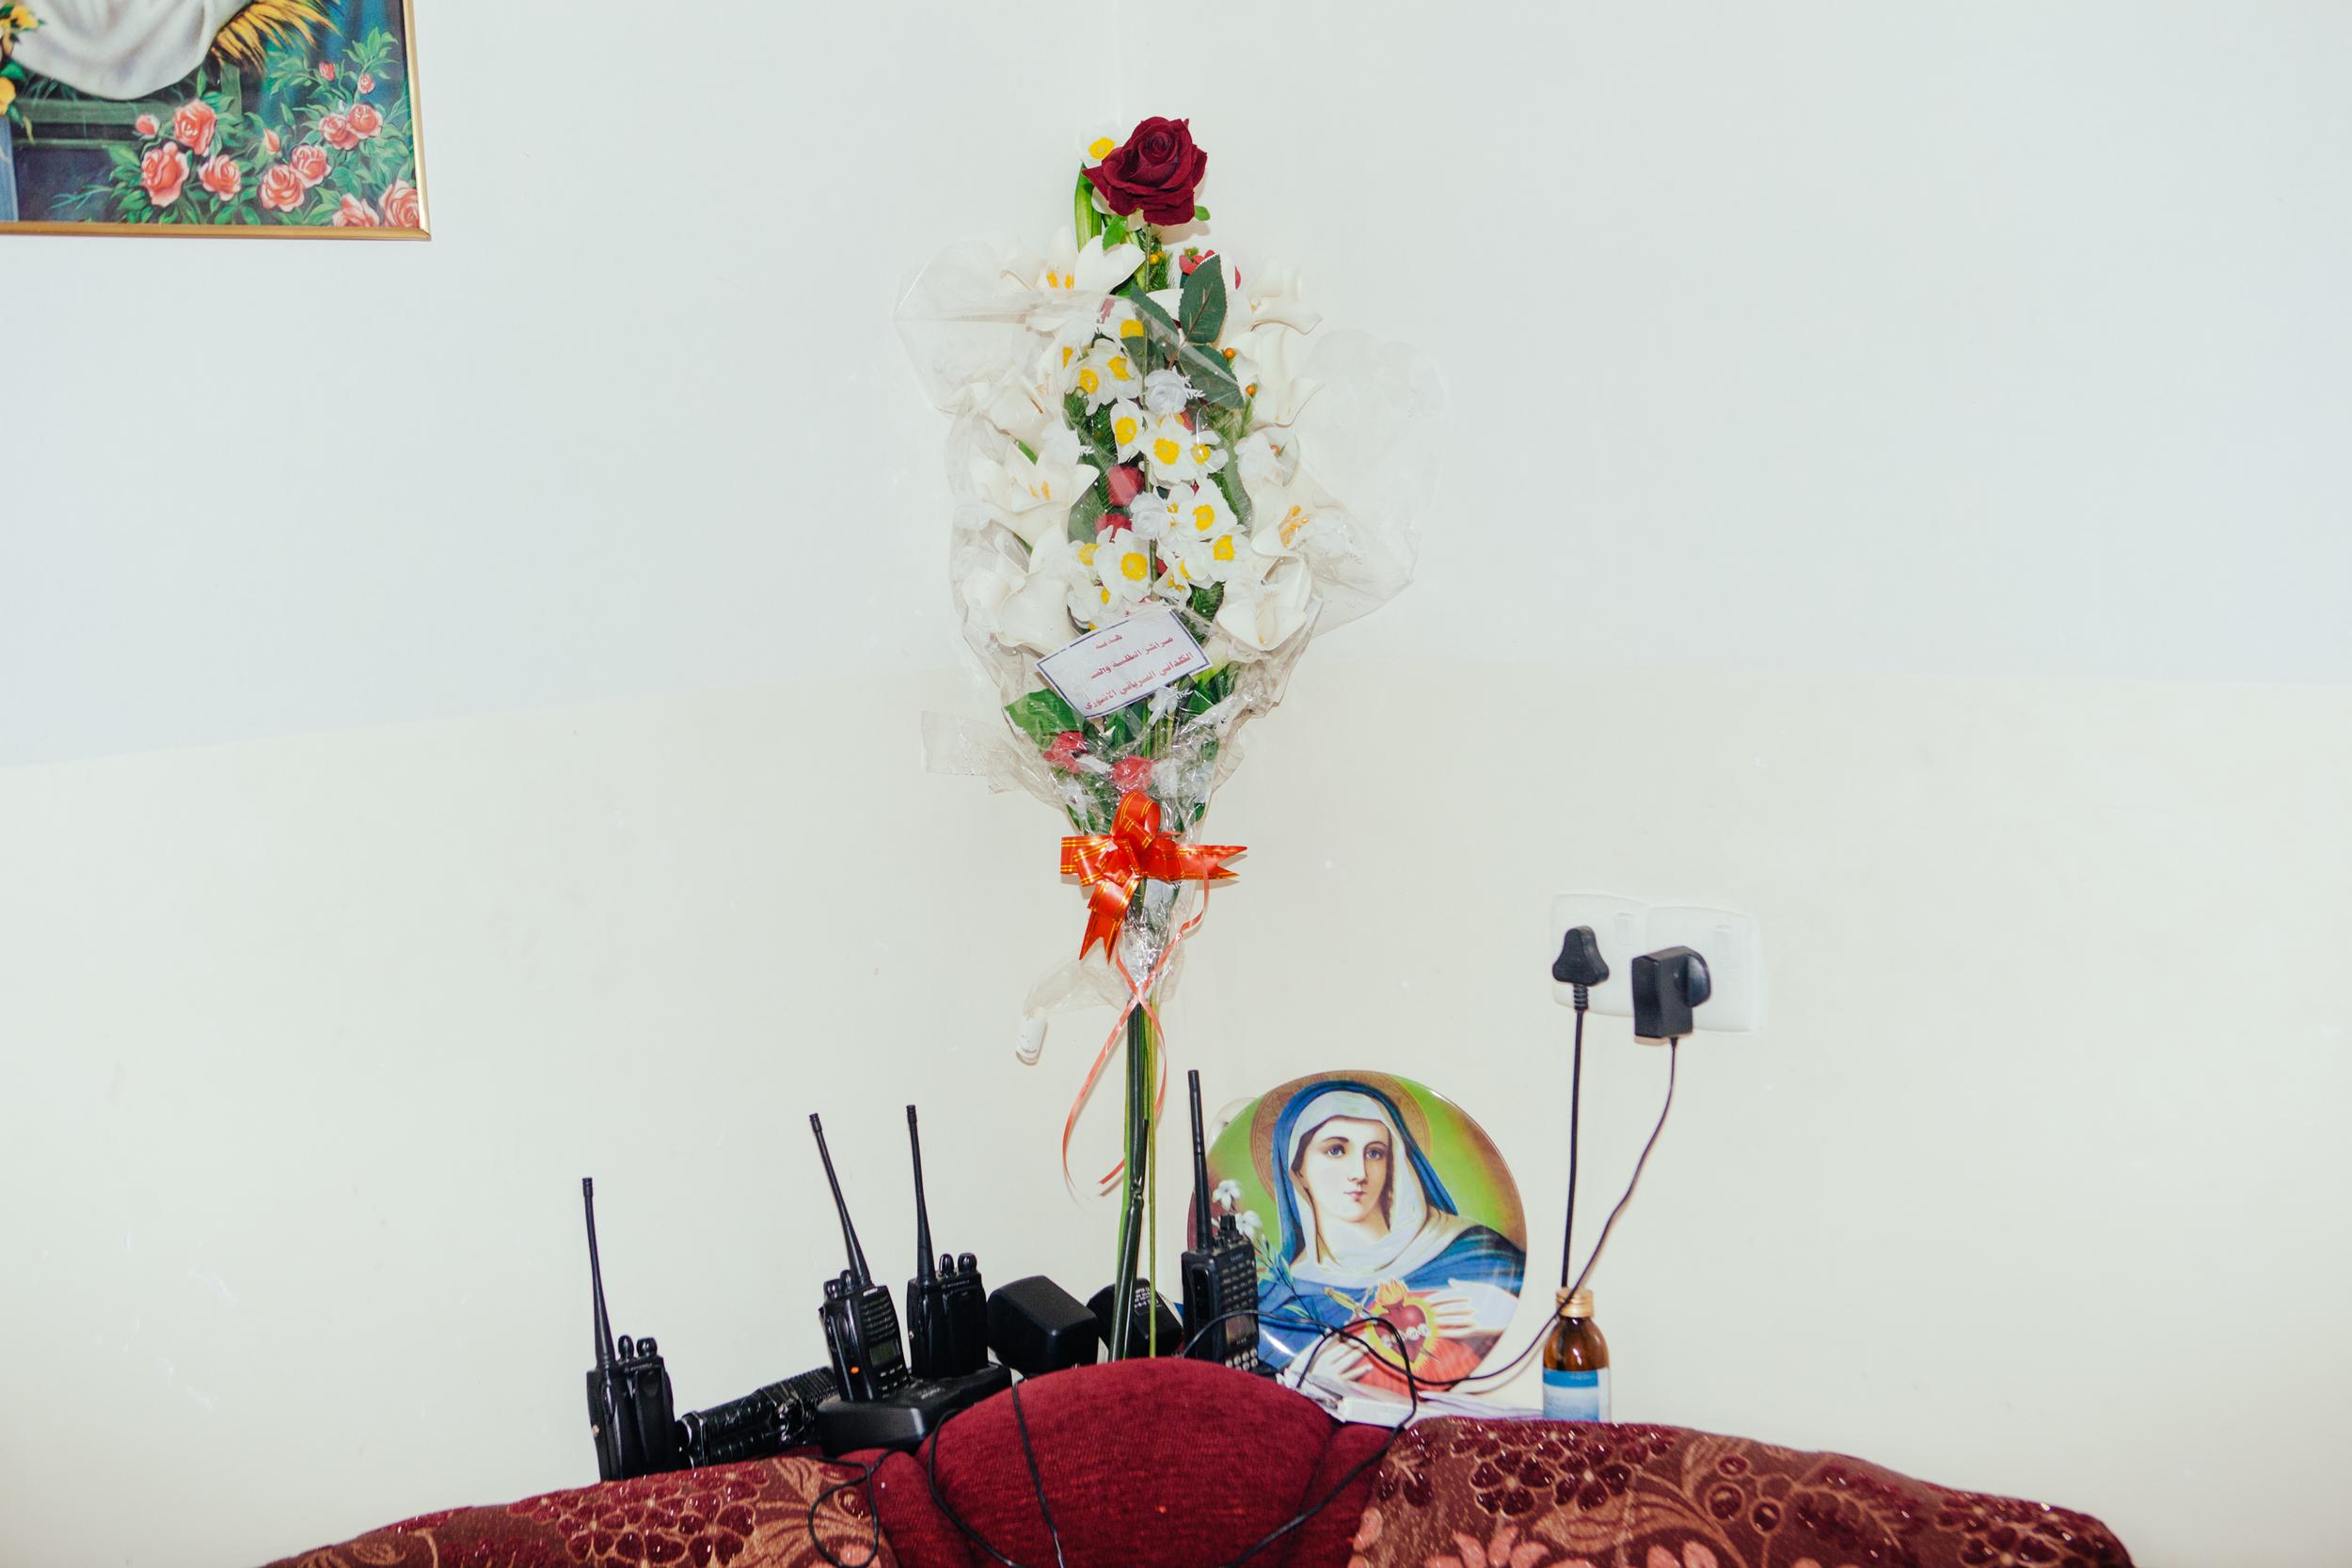 Flowers and radios adorn the walls at a Dwekh Nawsha military base near Baqofah,Northern Iraqi Kurdistan.